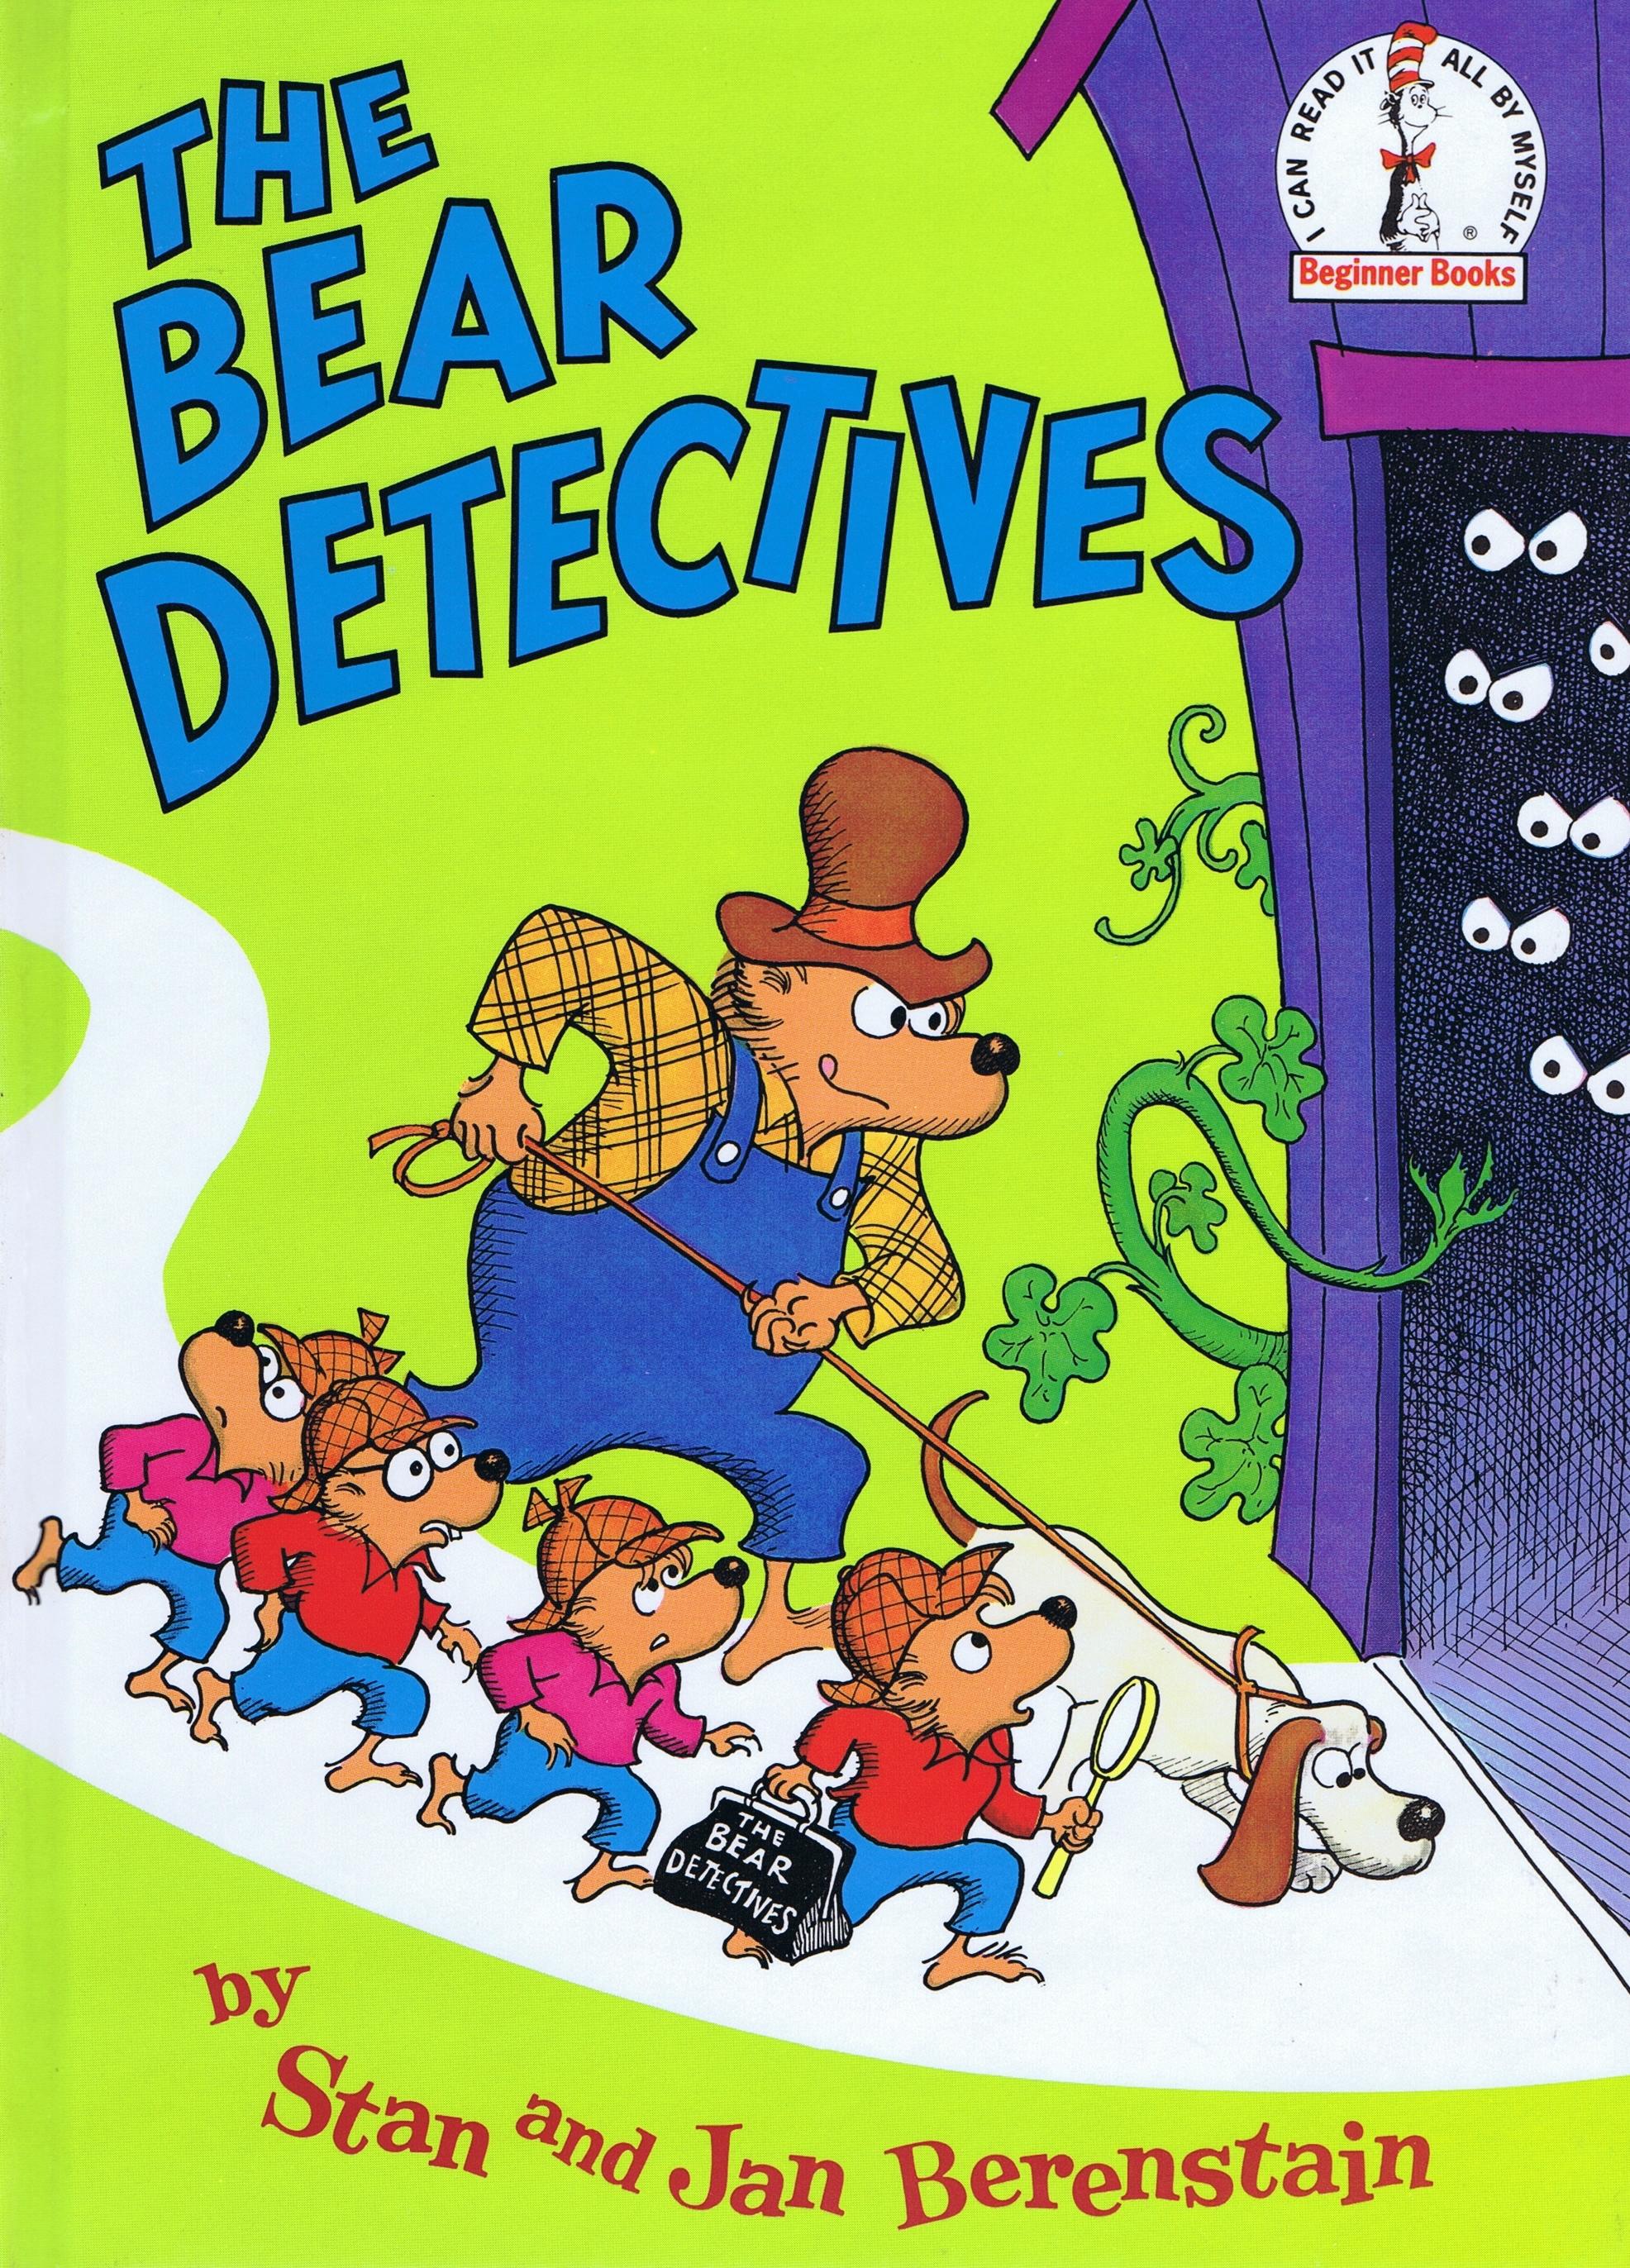 The bear detectives under inspection the berenstain bears blog